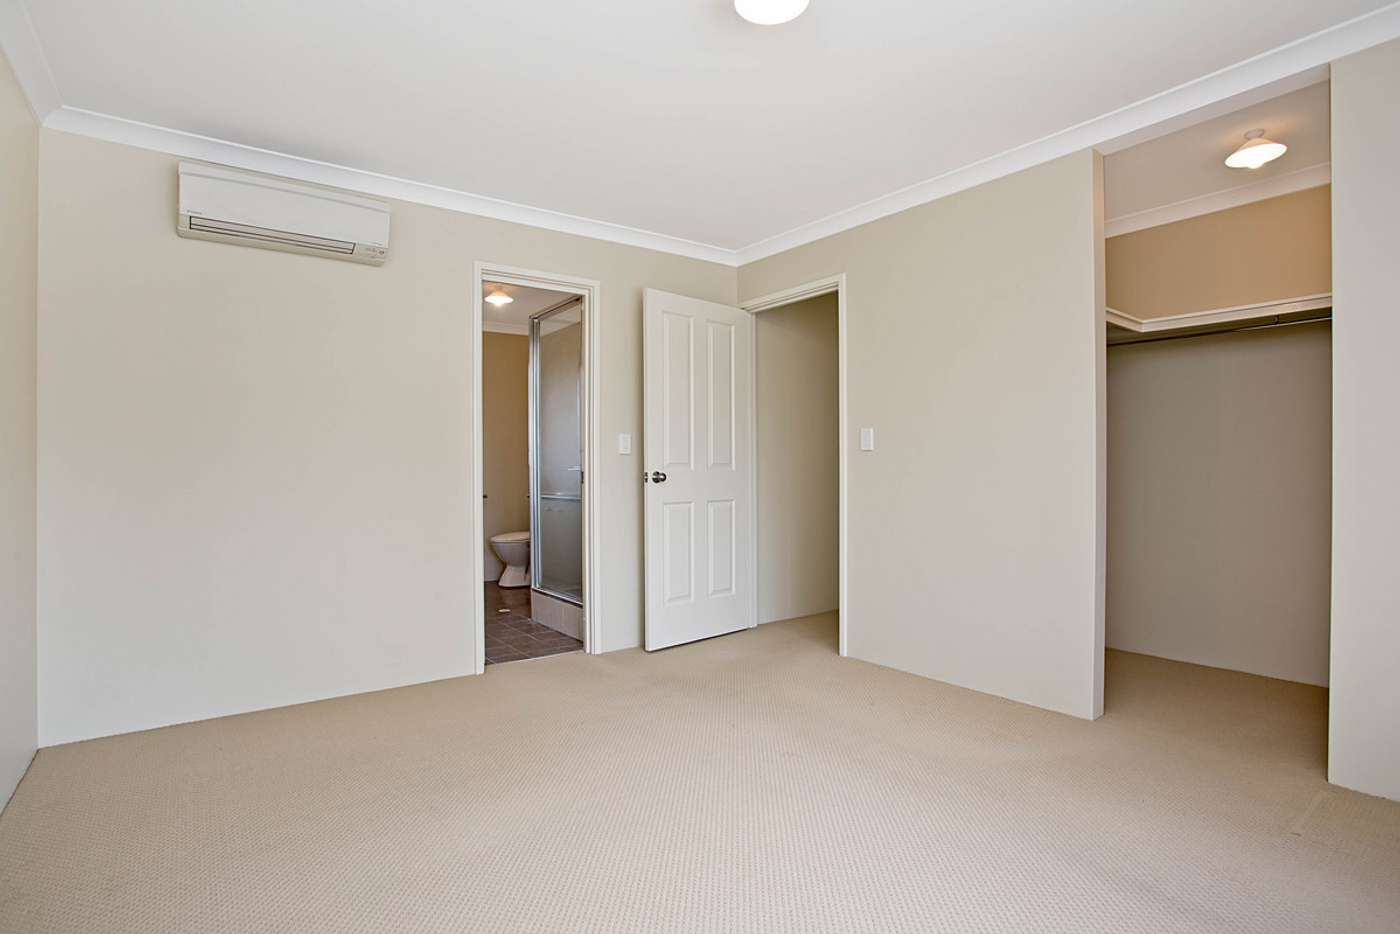 Seventh view of Homely house listing, 9 Elizabeth Street, Kewdale WA 6105